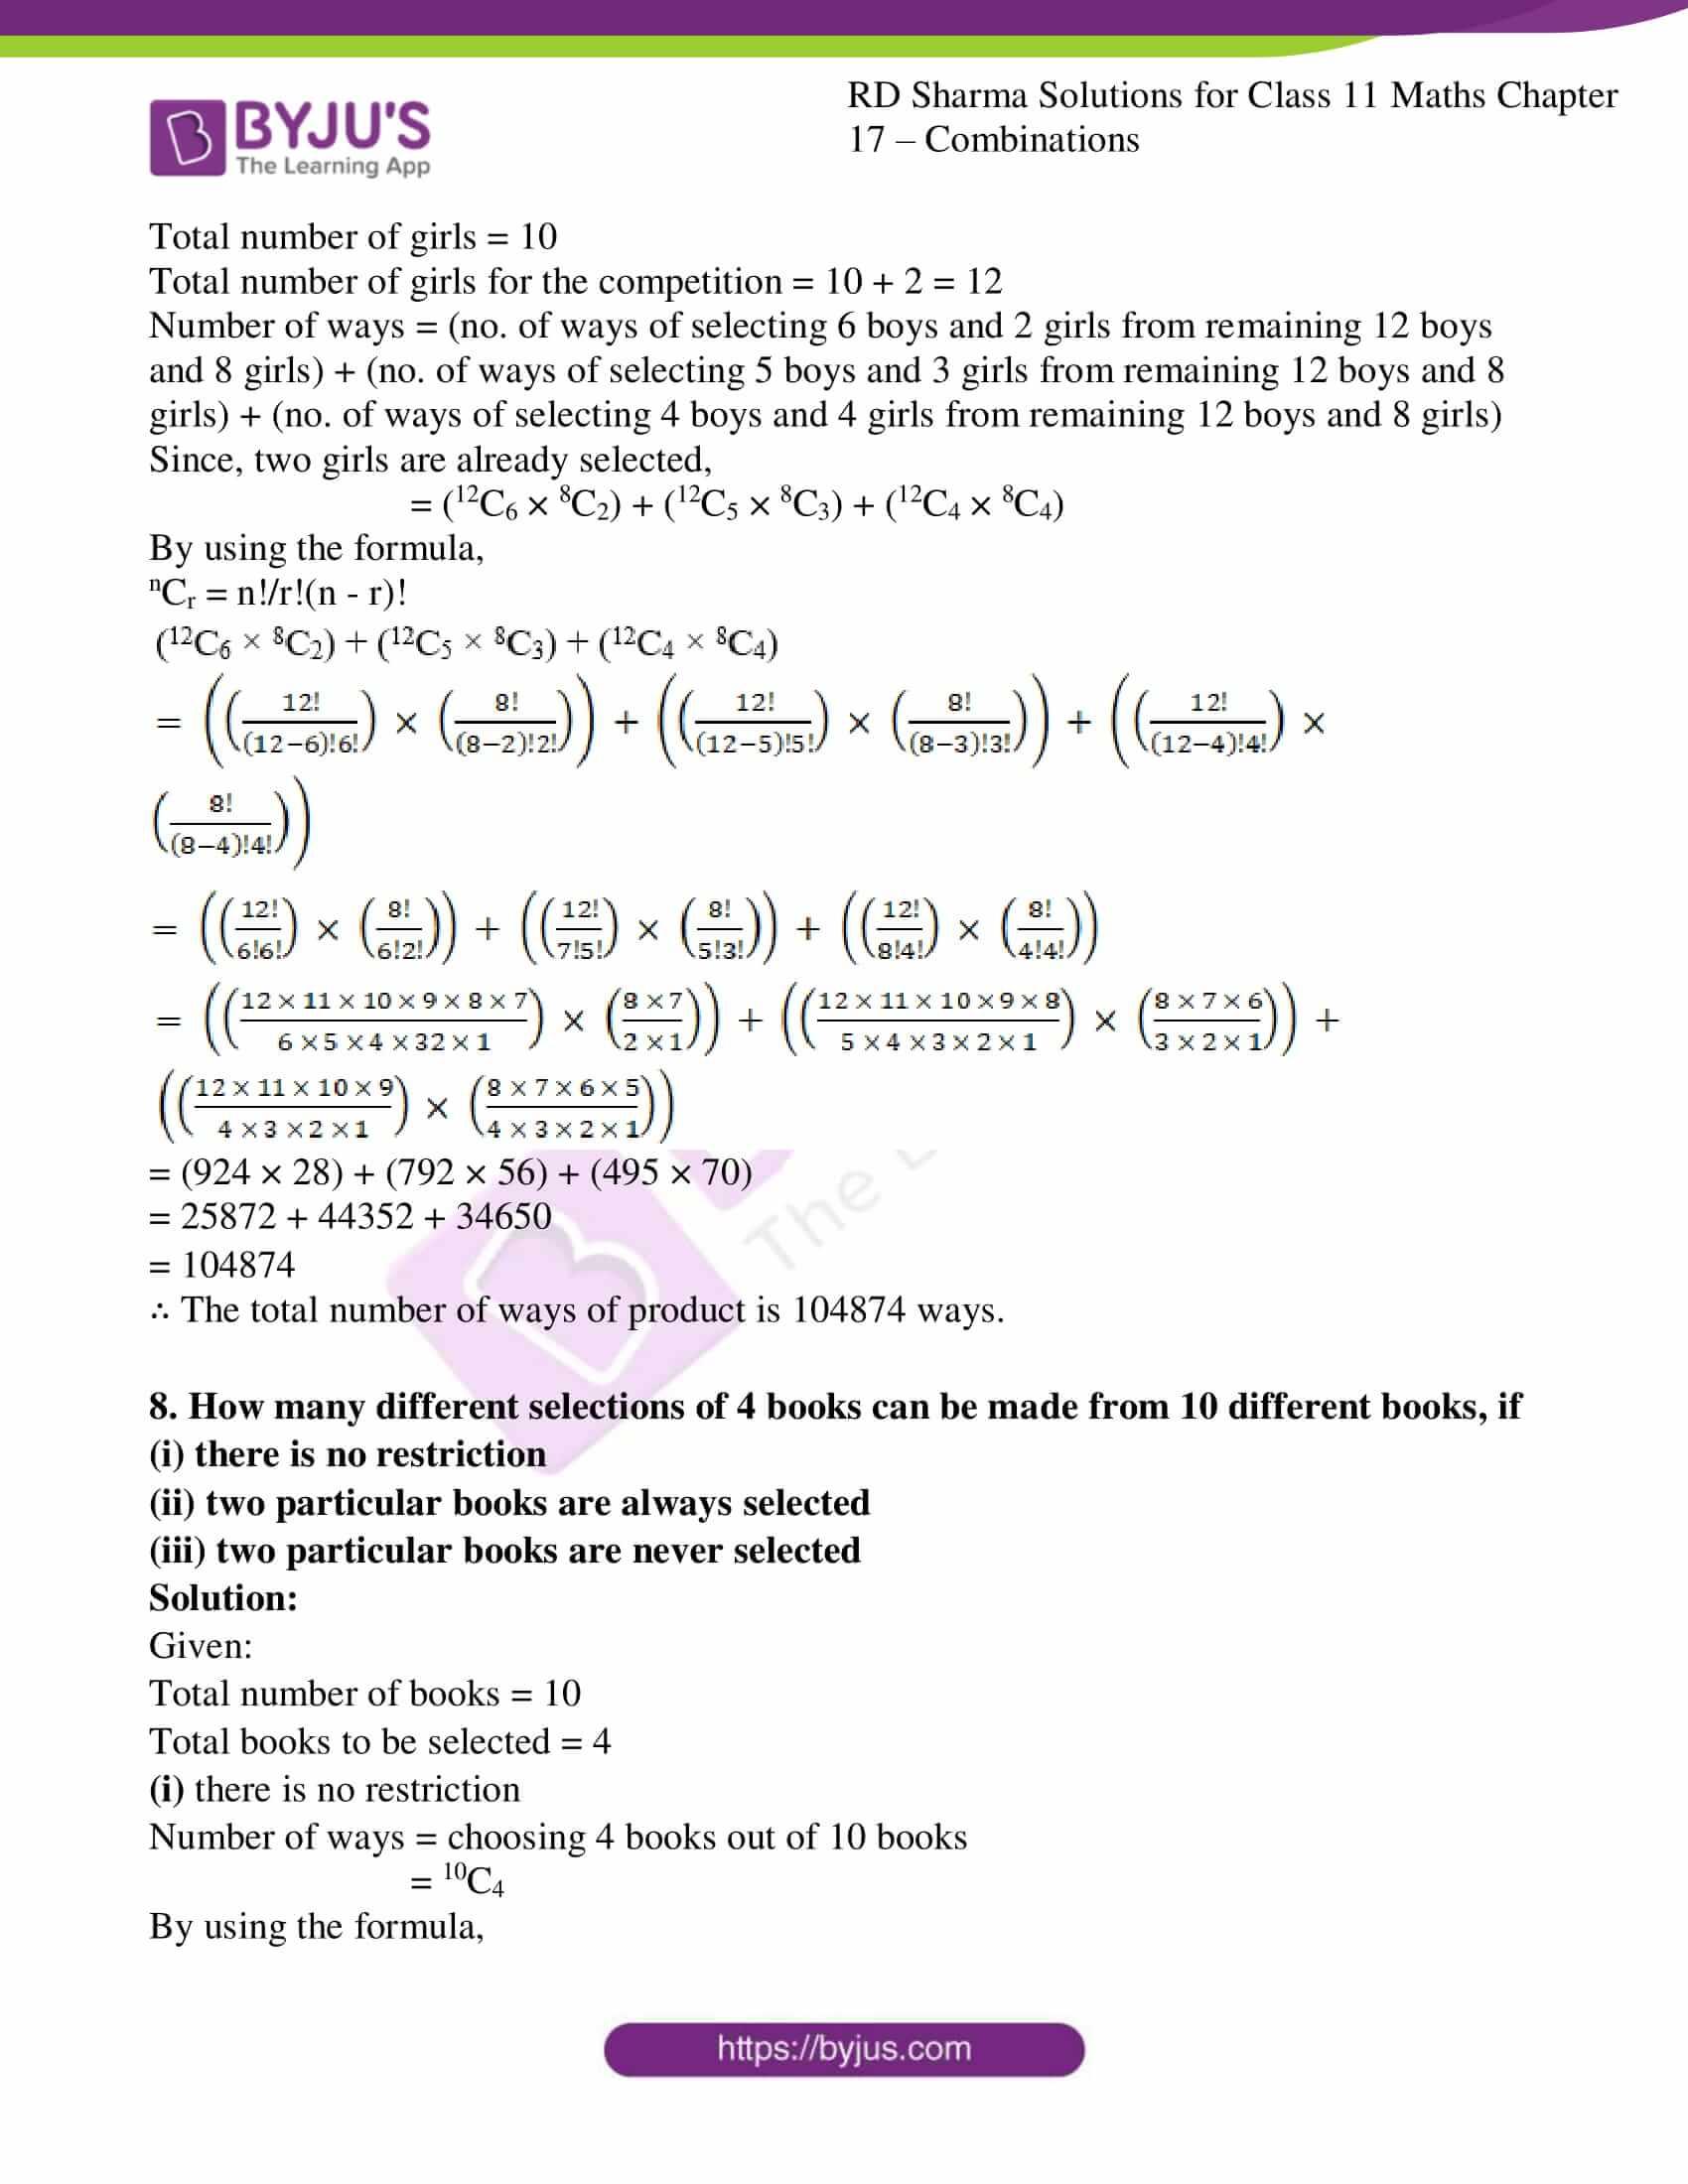 rd sharma class 11 maths ch 17 ex 2 06